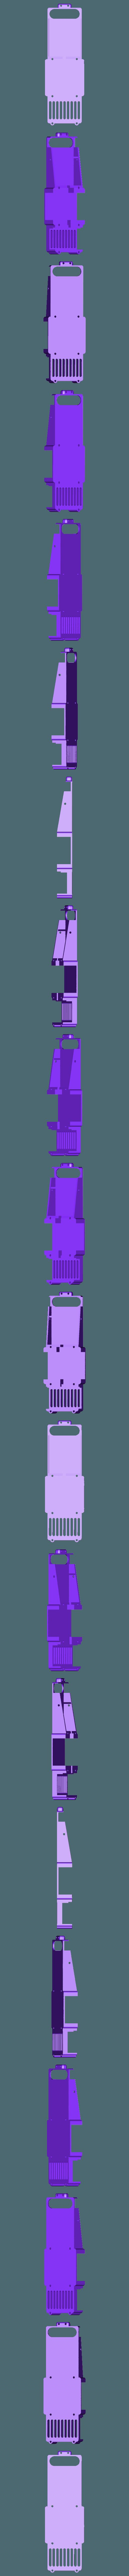 paramoteur.STL Download STL file Paraglider Hobby King • 3D printer object, Aeronmax